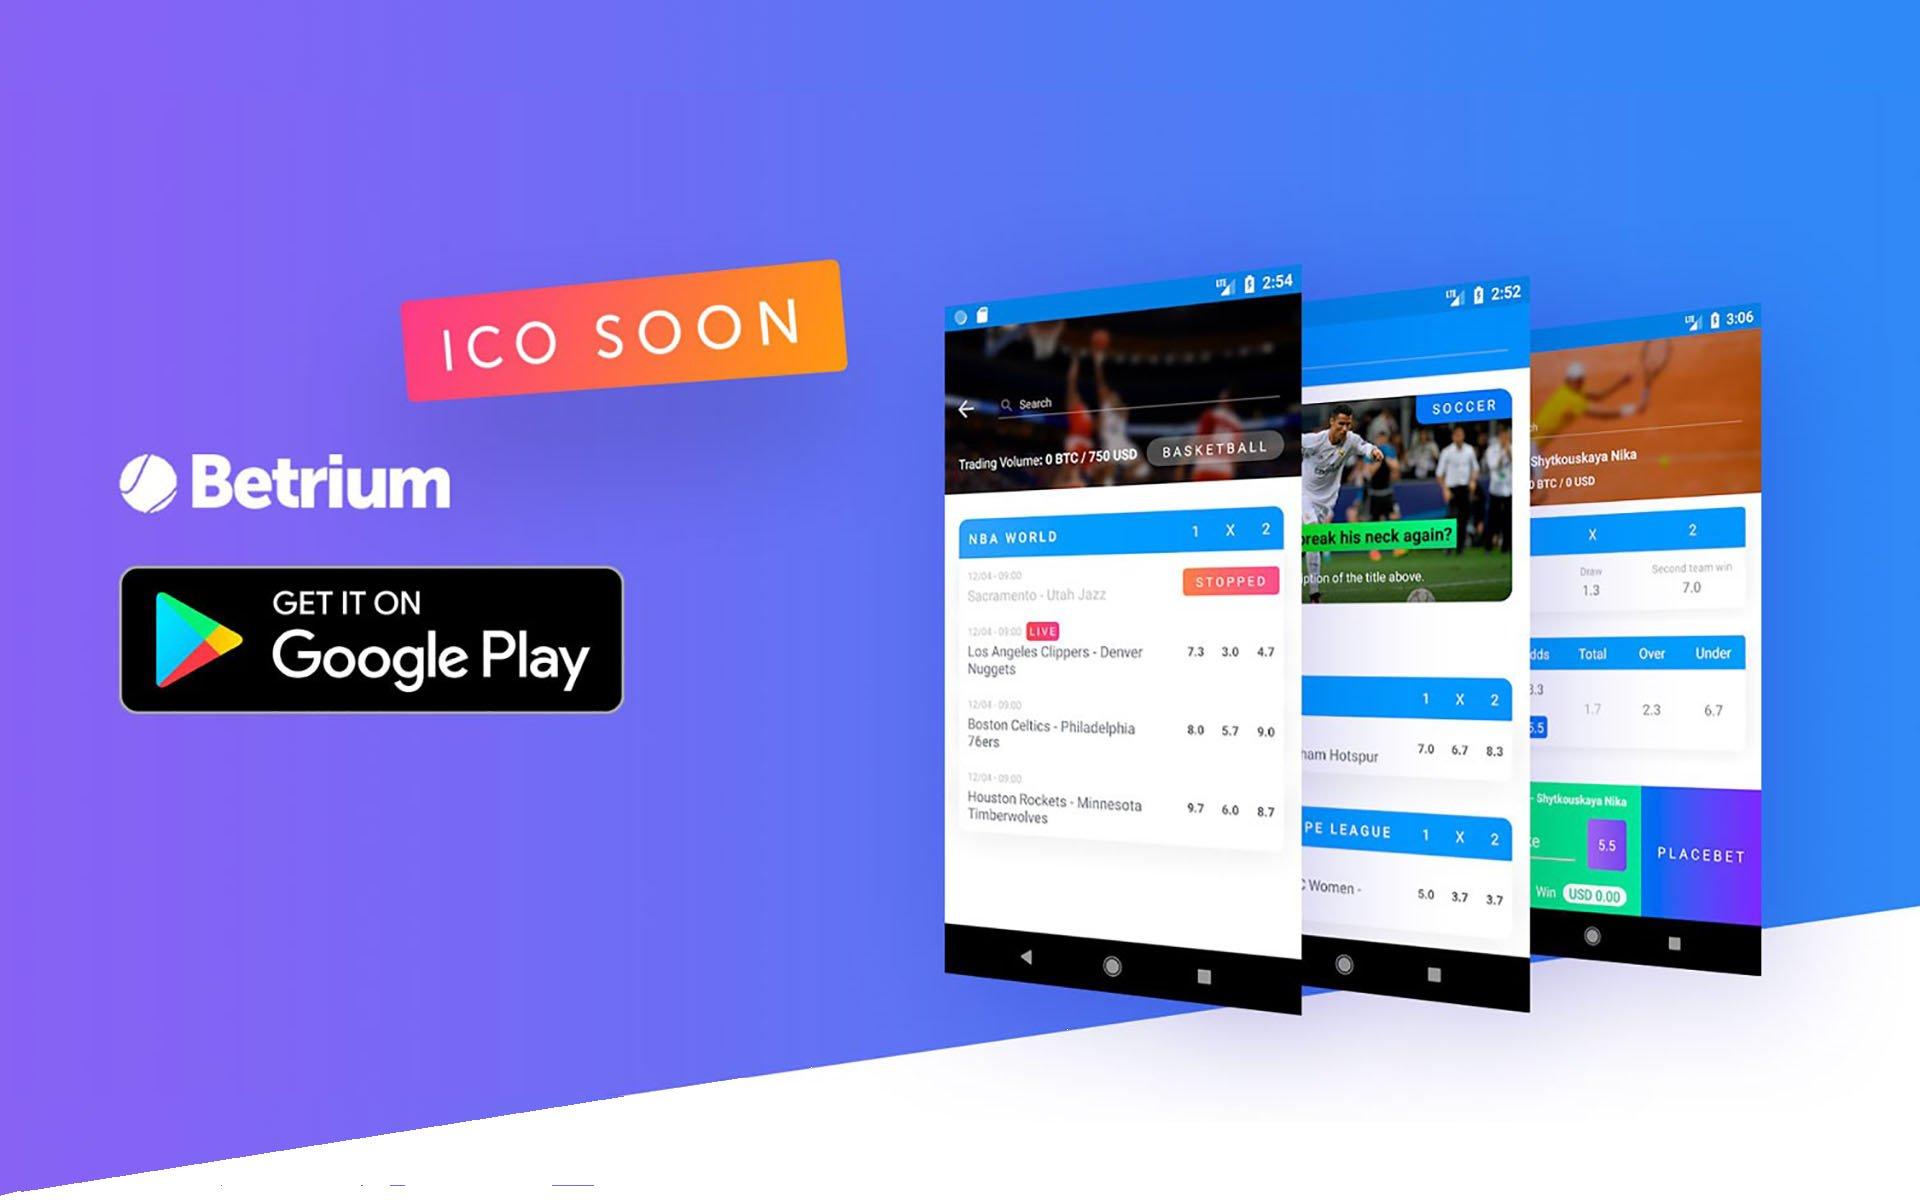 Betrium ICO Soon — 20% One Day Bonus, 4 Demos Released!